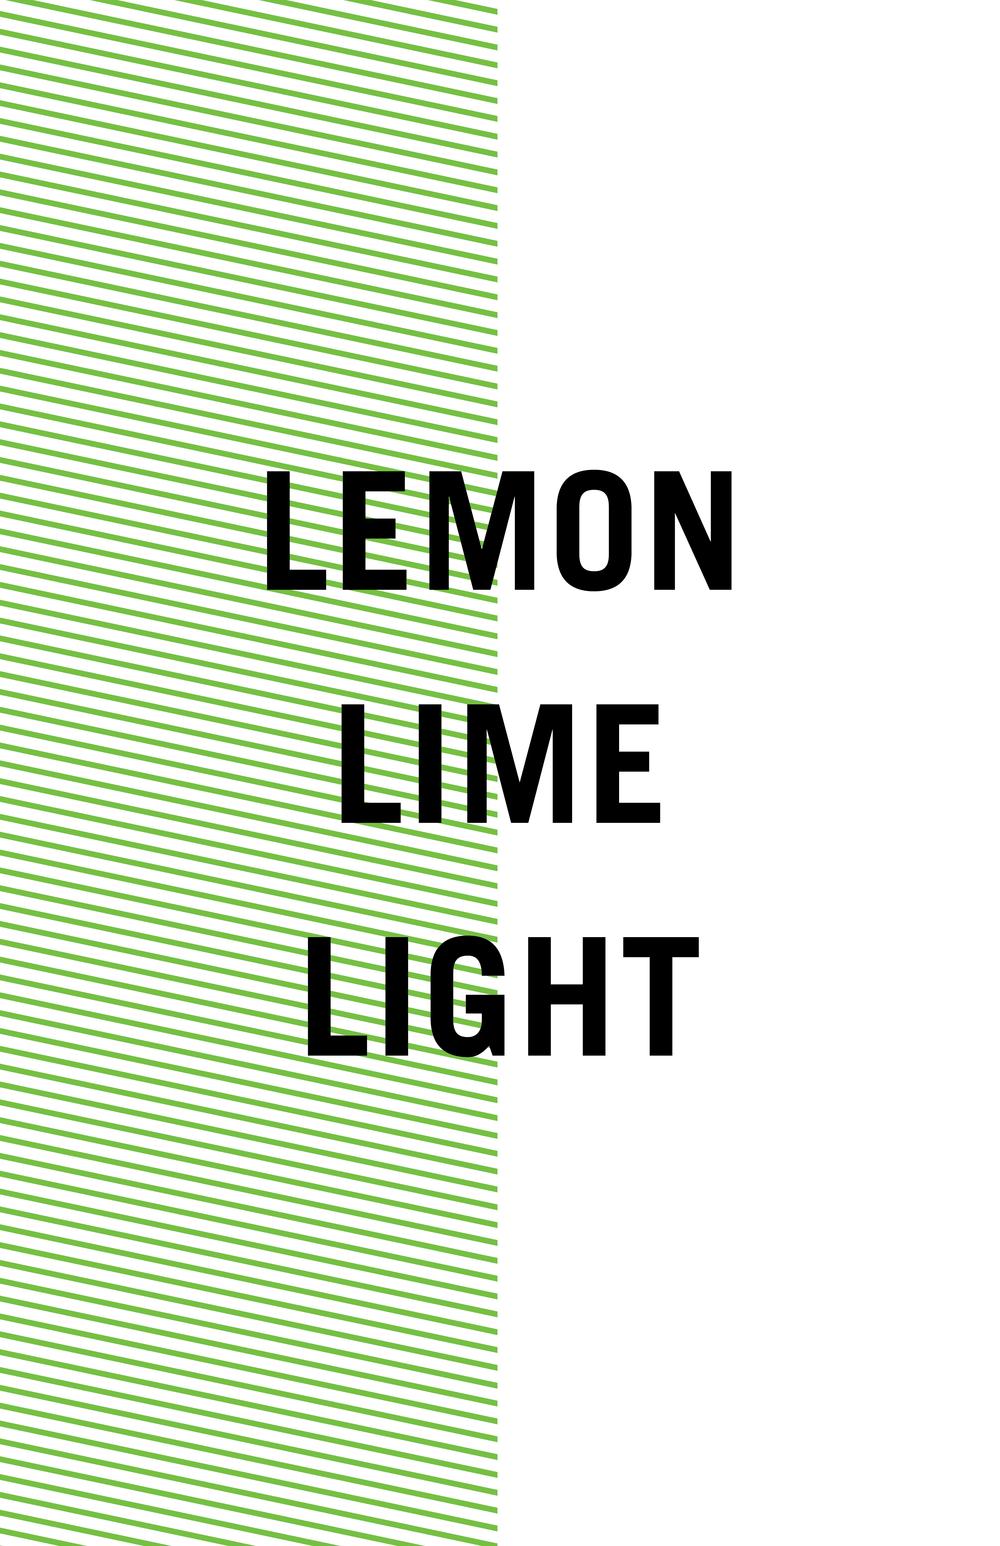 LemonLimeLight-03.png